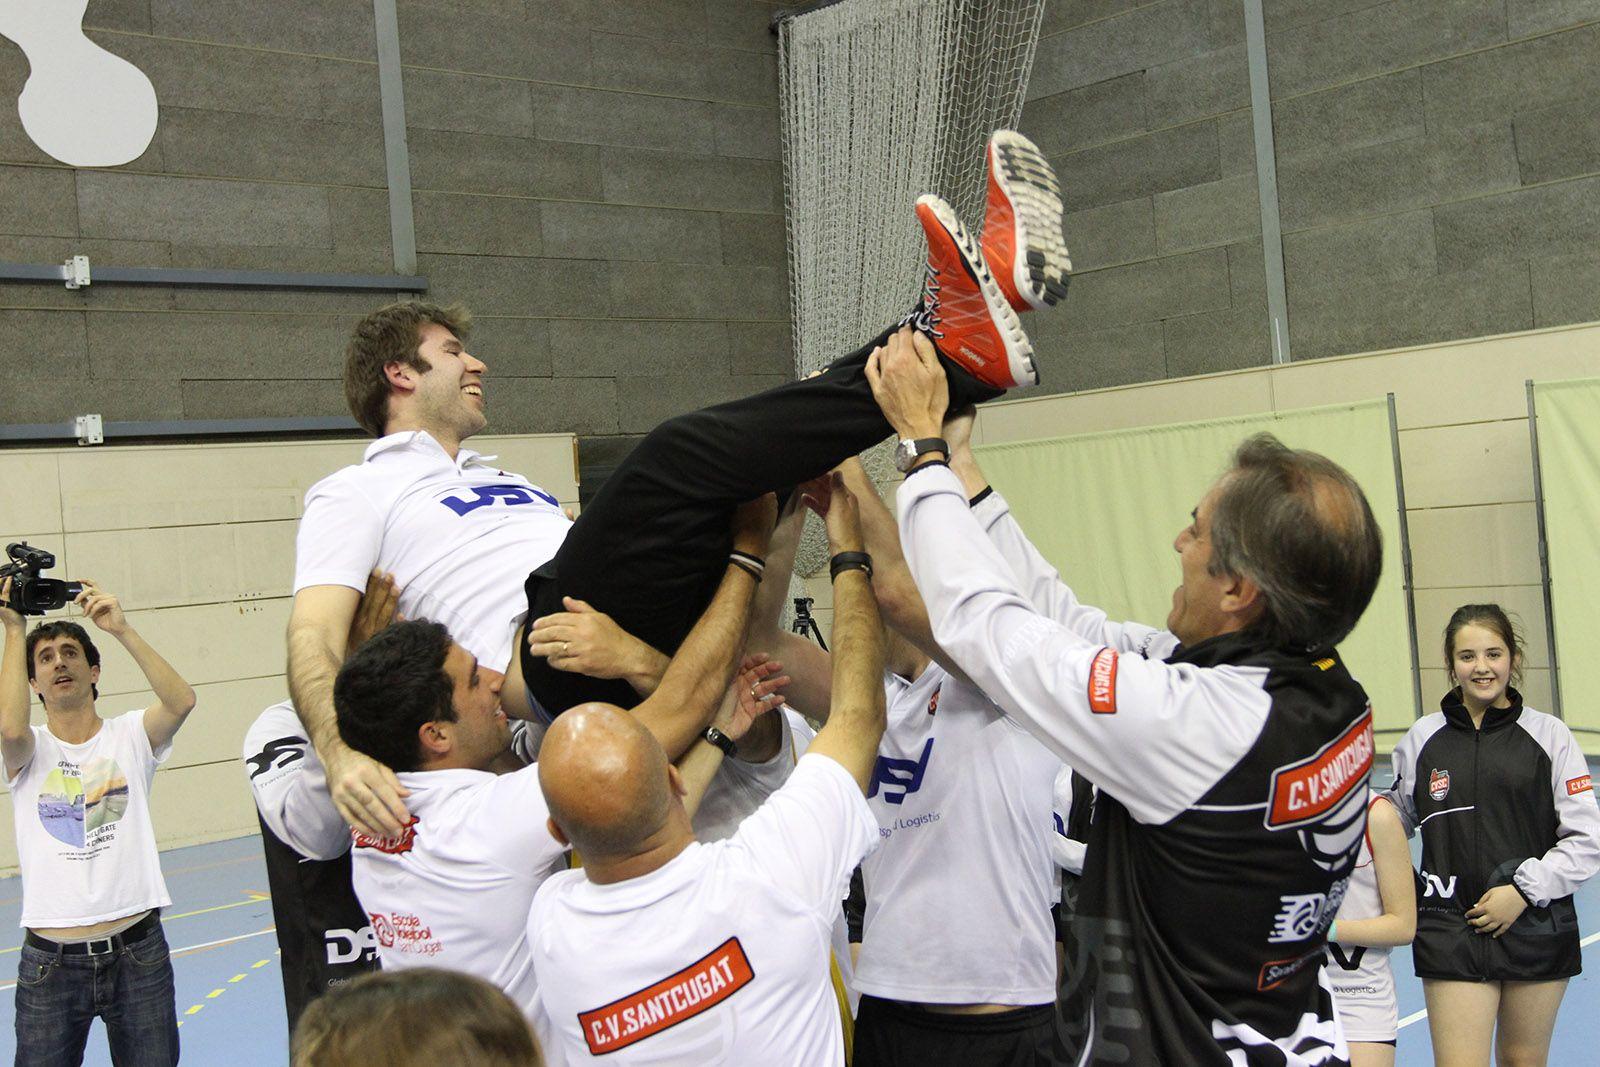 L'entrenador, Rafa Ruiz, ha acabat mantejat FOTO: Haidy Blanch